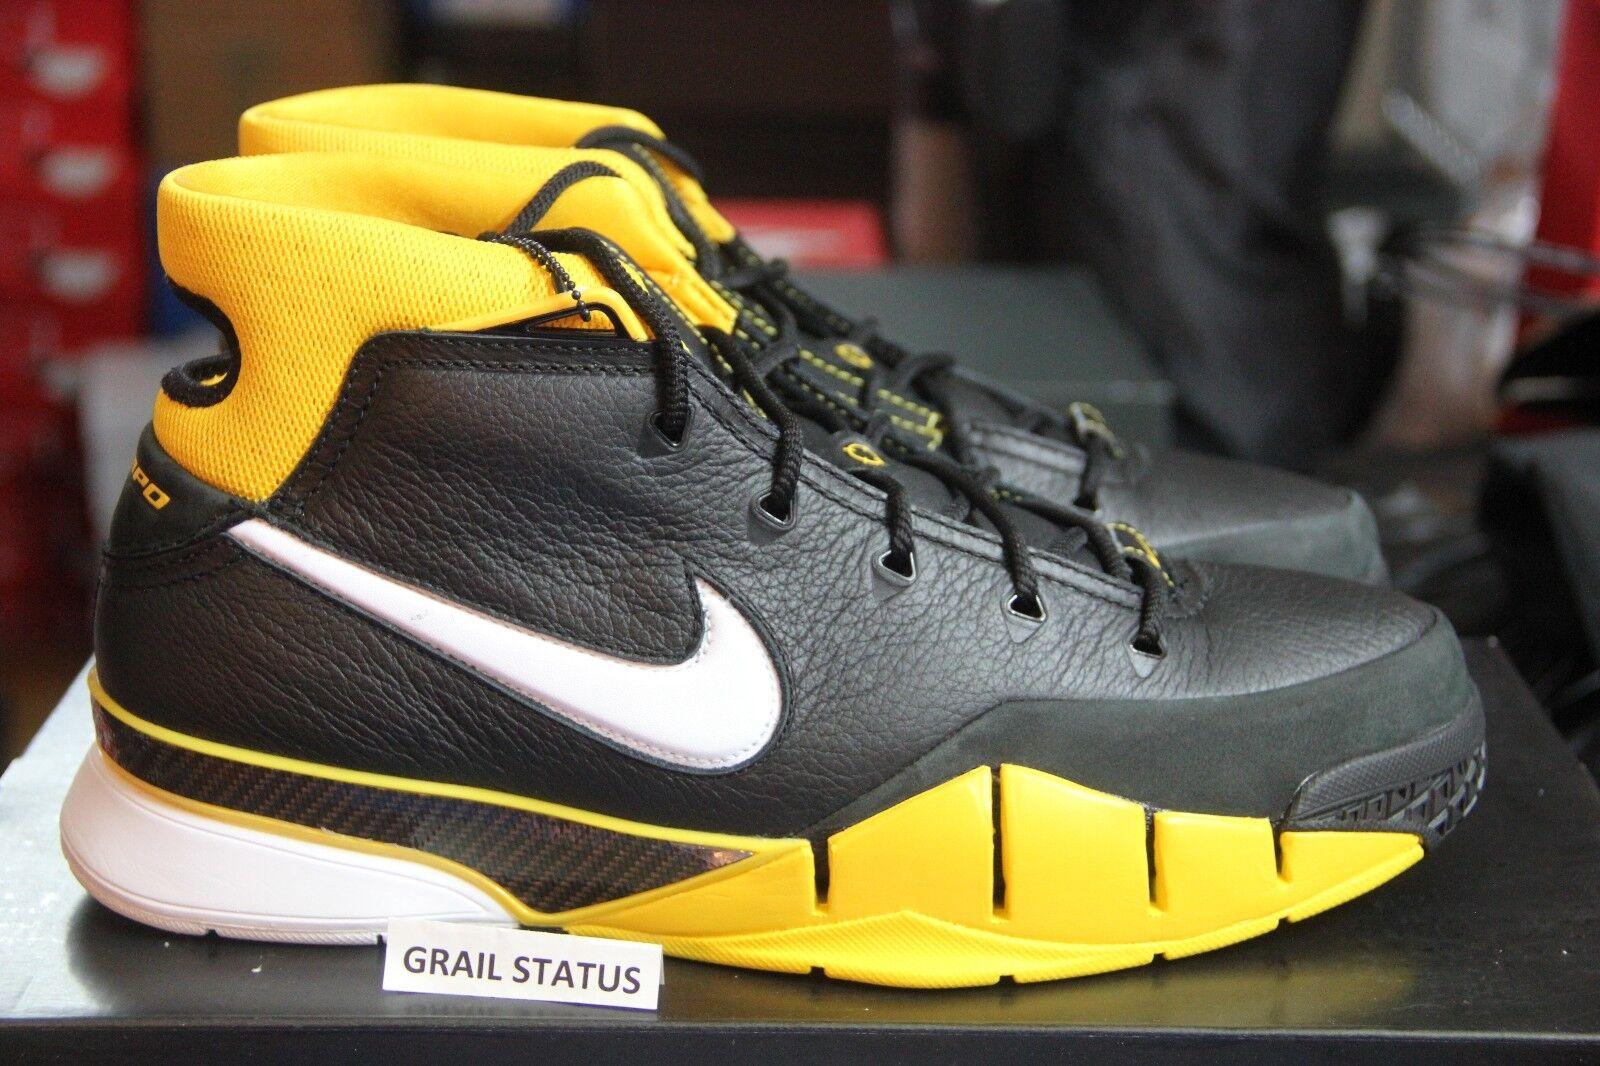 Nike - 1 protro nero / bianco del mais imbattuto aq2728 qs uomini sz gli 8 e i 13